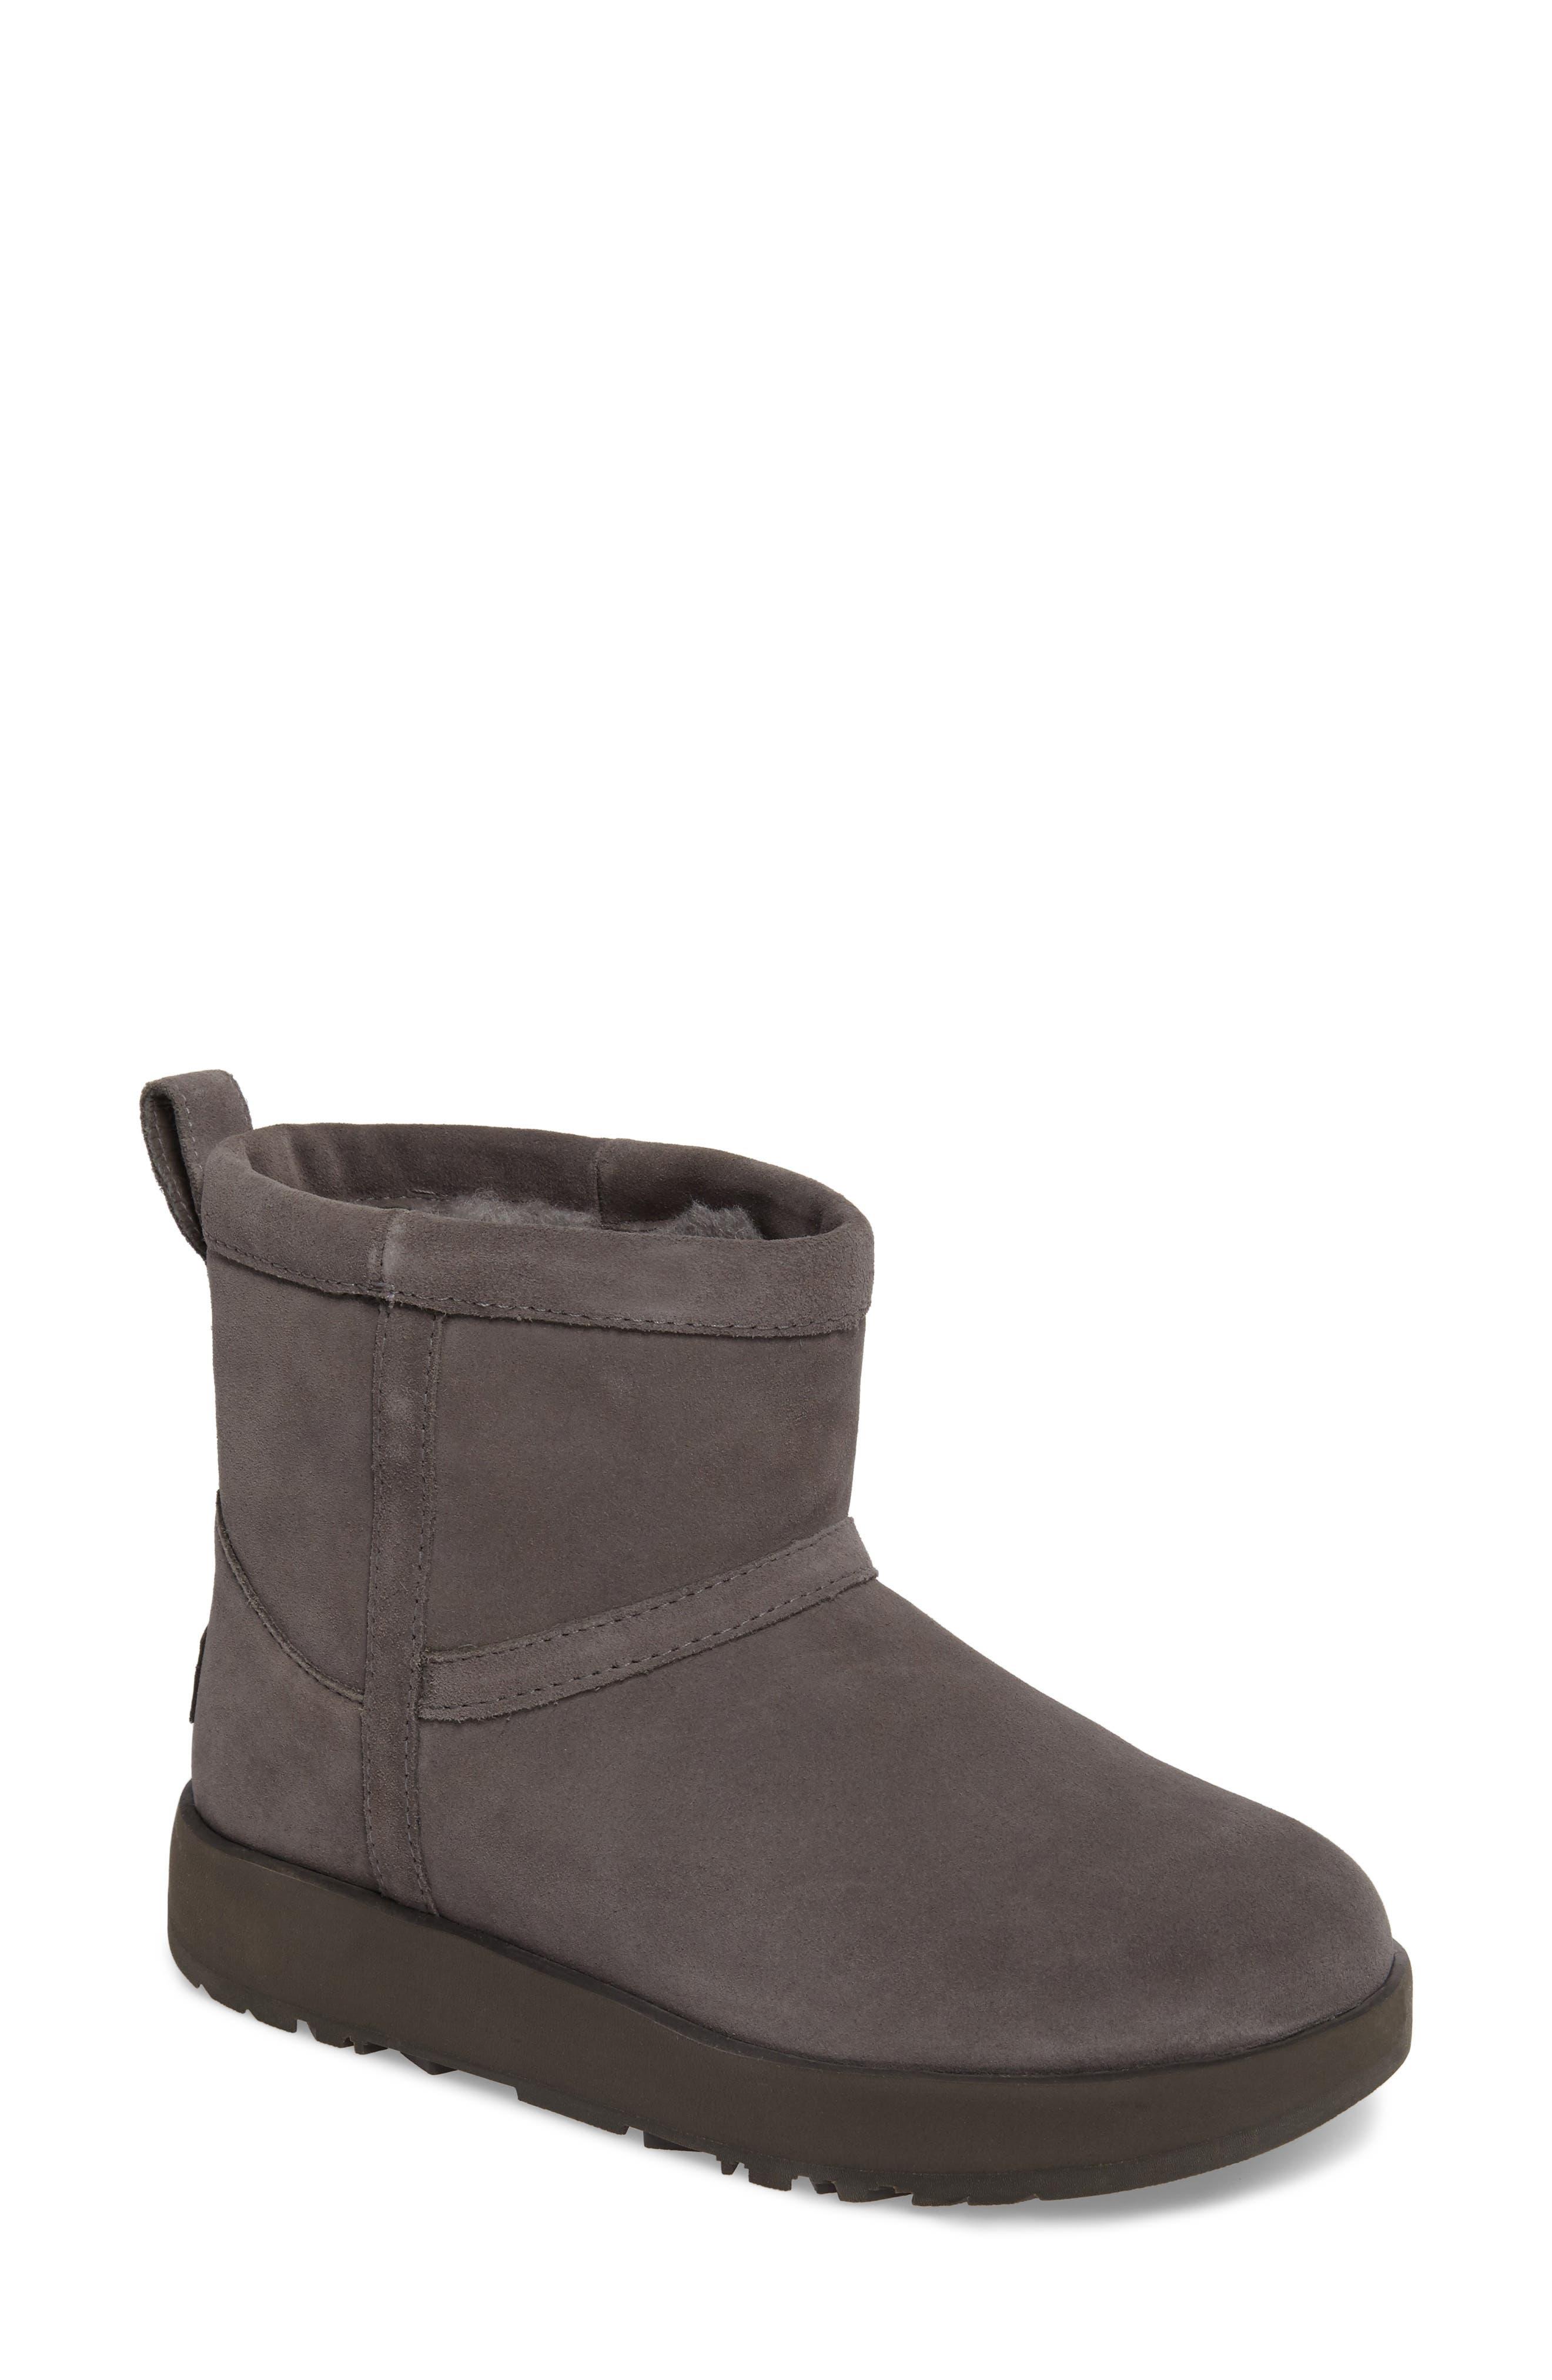 Alternate Image 1 Selected - UGG® Classic Mini Waterproof Boot (Women)